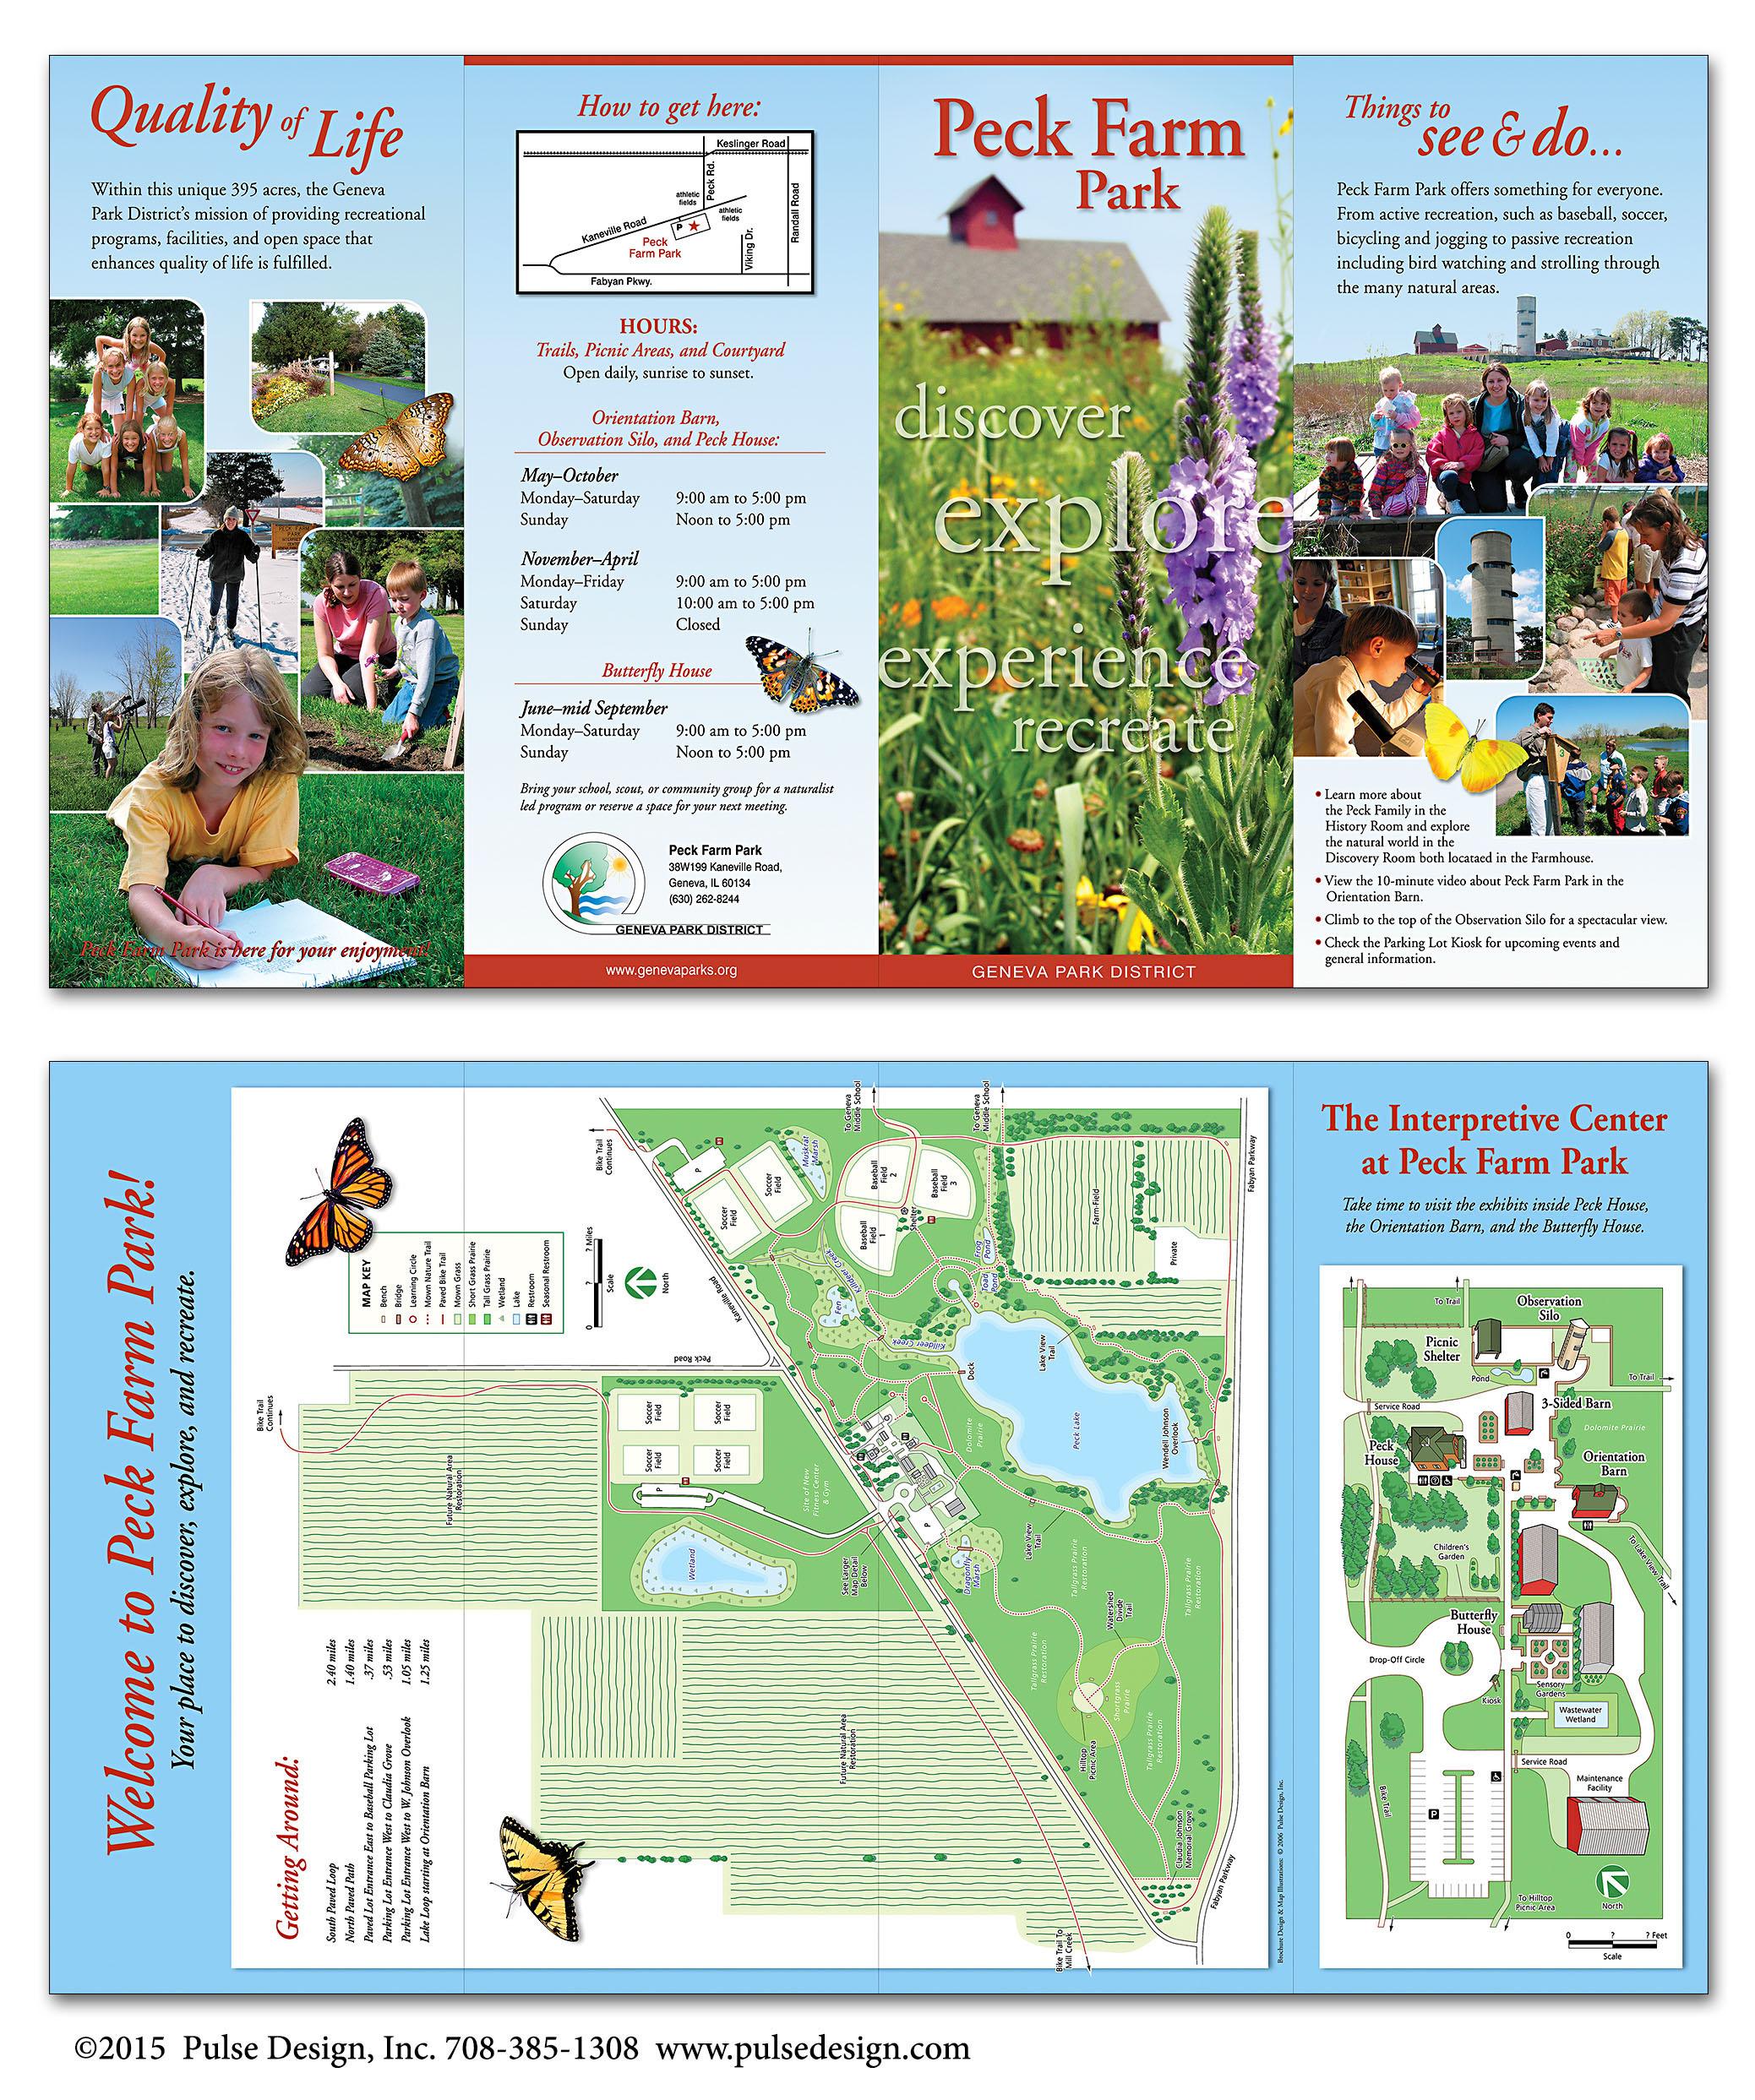 map-peck-farm-park-pulse-design-inc.jpg